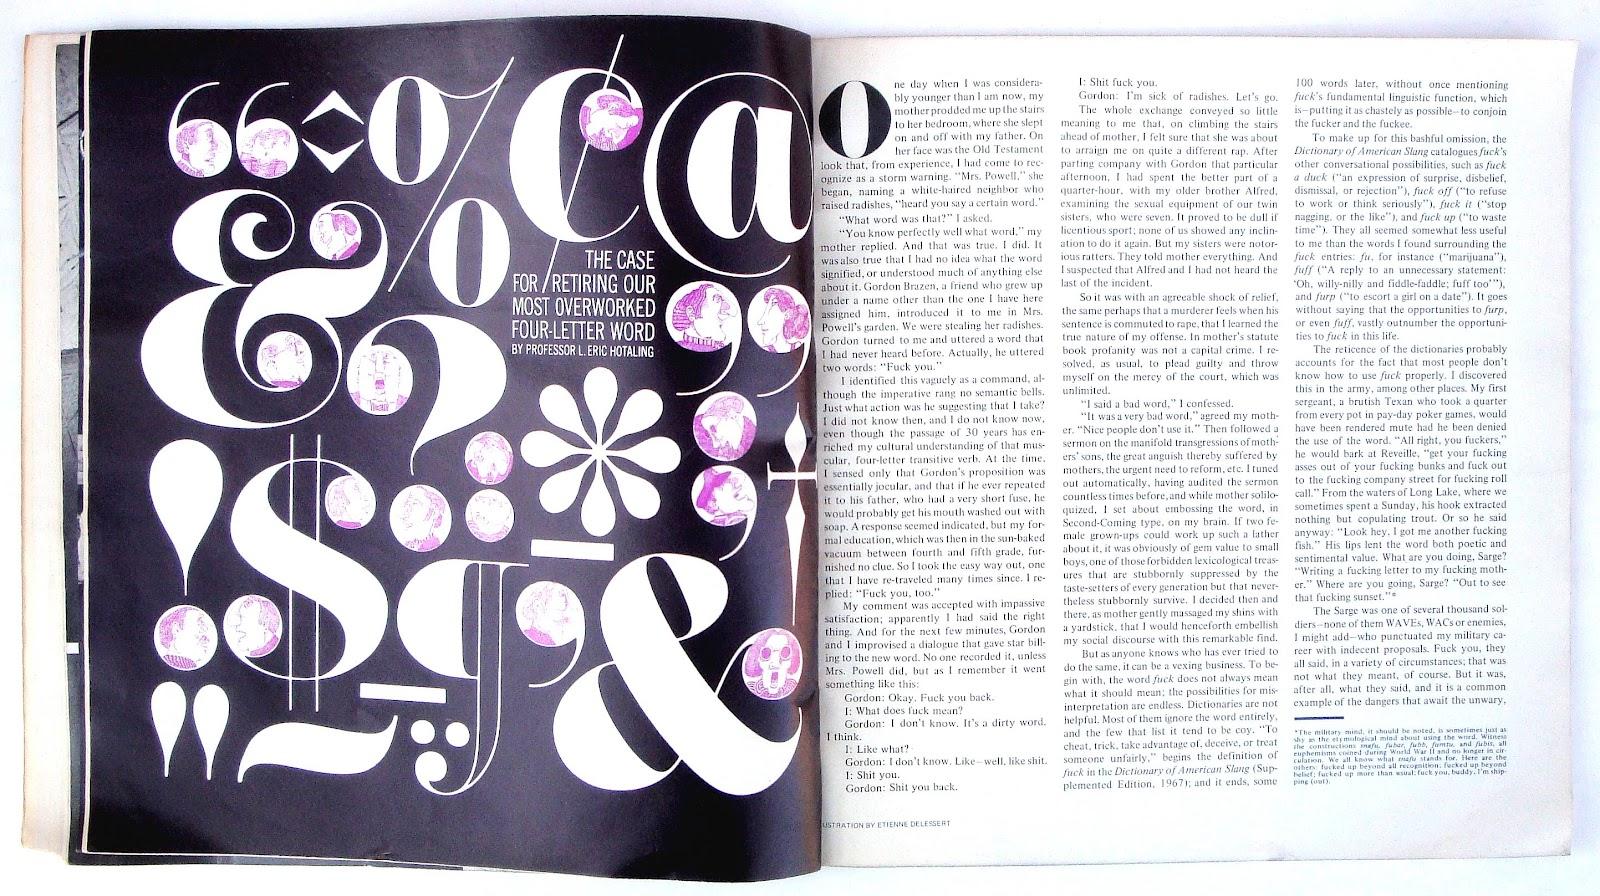 avant garde and mainstream society The avant-garde (/ ˌ æ v ɒ̃ ˈ ɡ ɑːr d / relation to mainstream society the concept of avant-garde refers primarily to artists, writers, composers and.